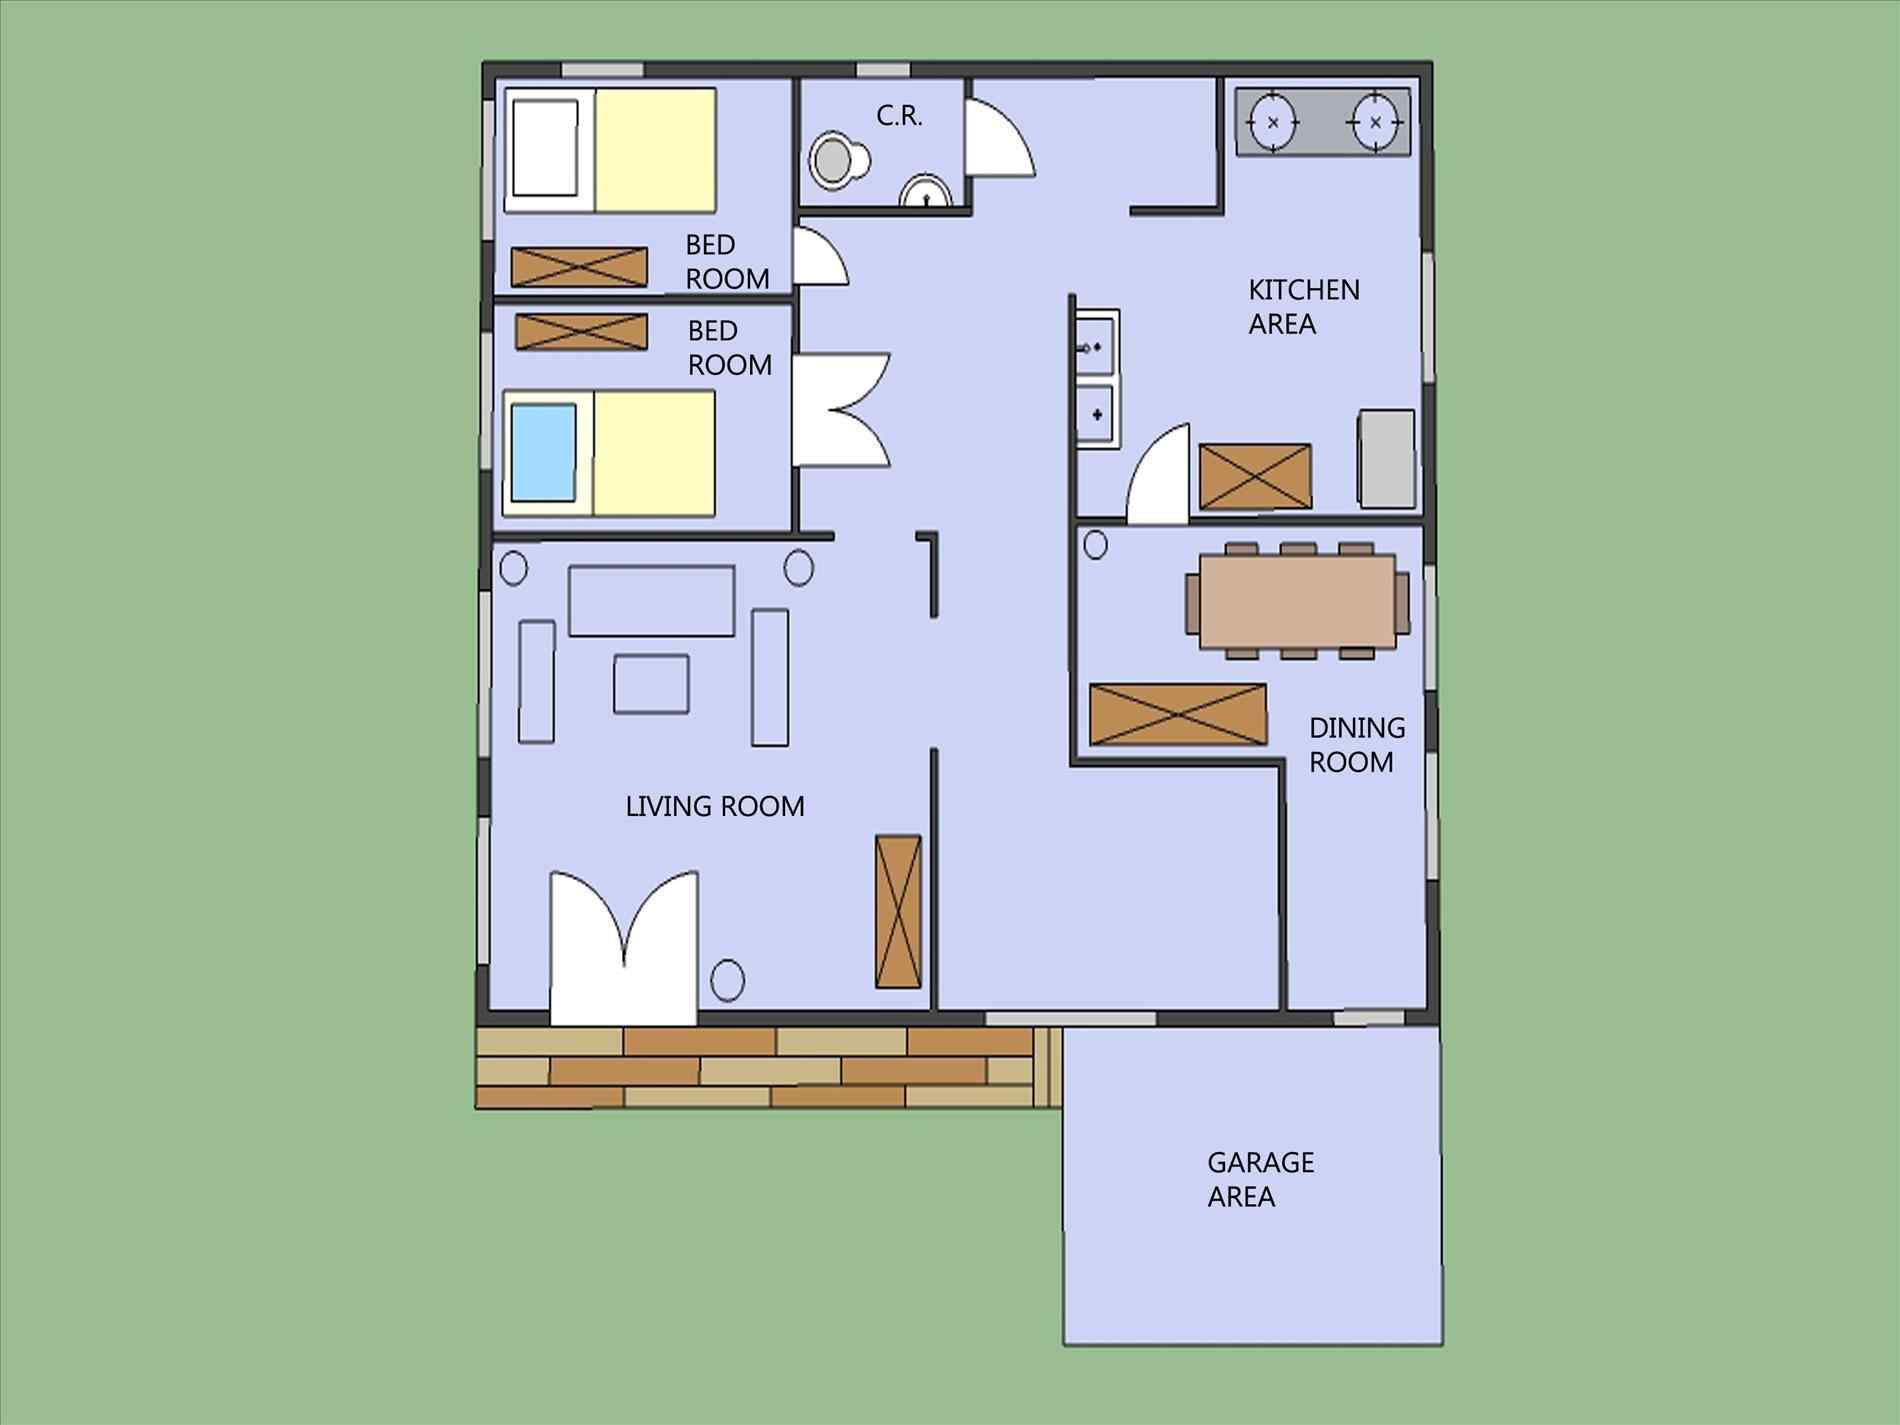 1900x1425 Inside House Sketch